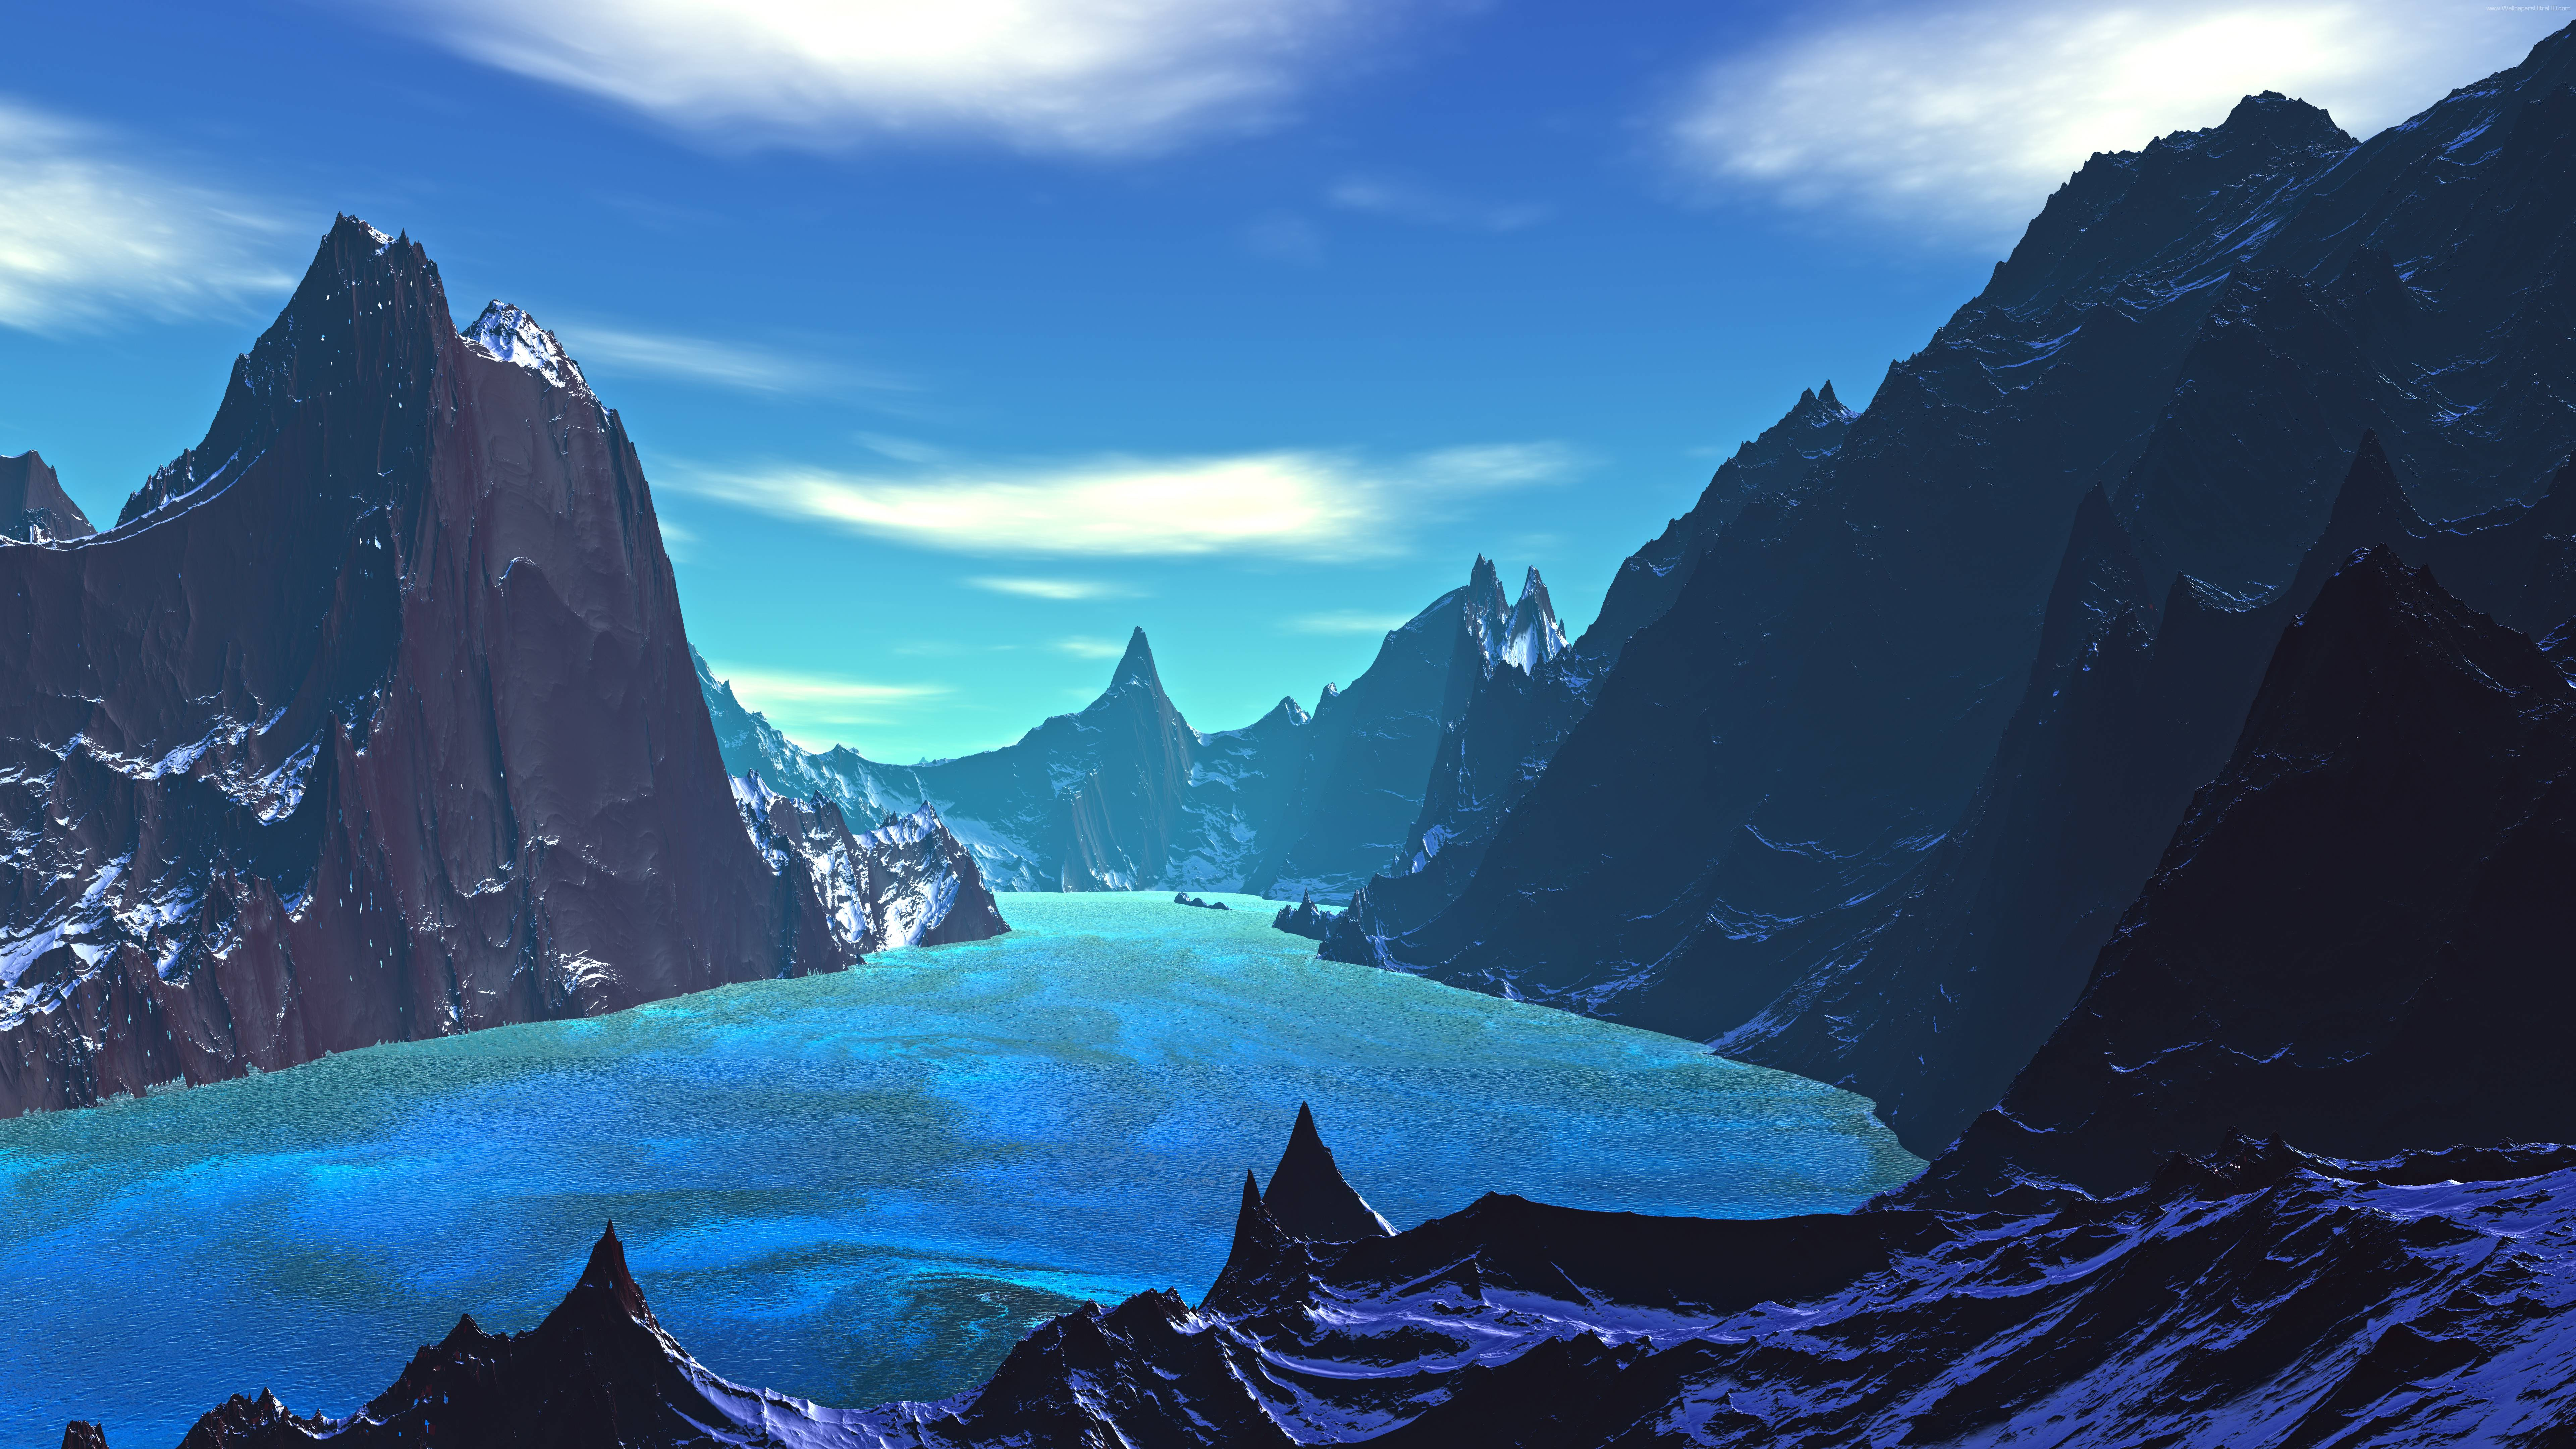 4k Wallpaper: Lake 8k Blue Landscape Artistic, HD Artist, 4k Wallpapers